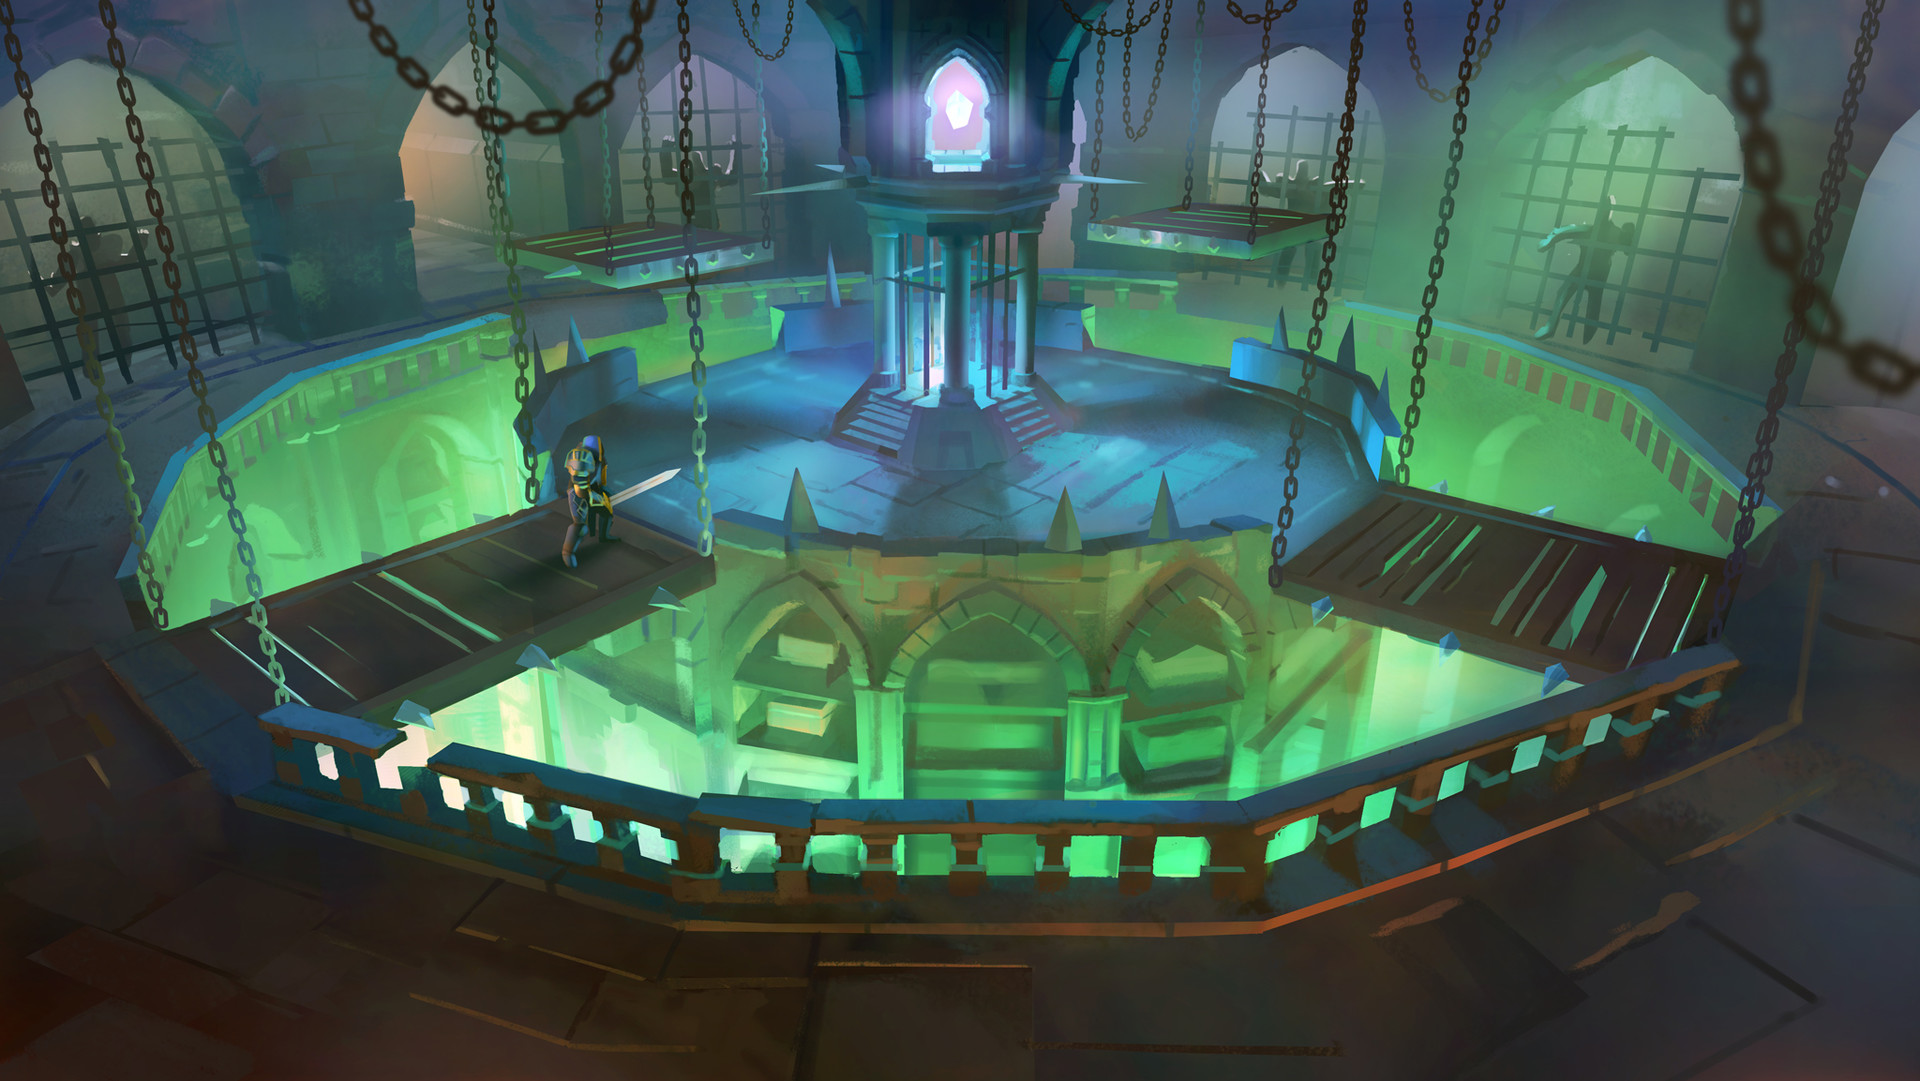 Adrien girod dh phd concept elevator room 06 72